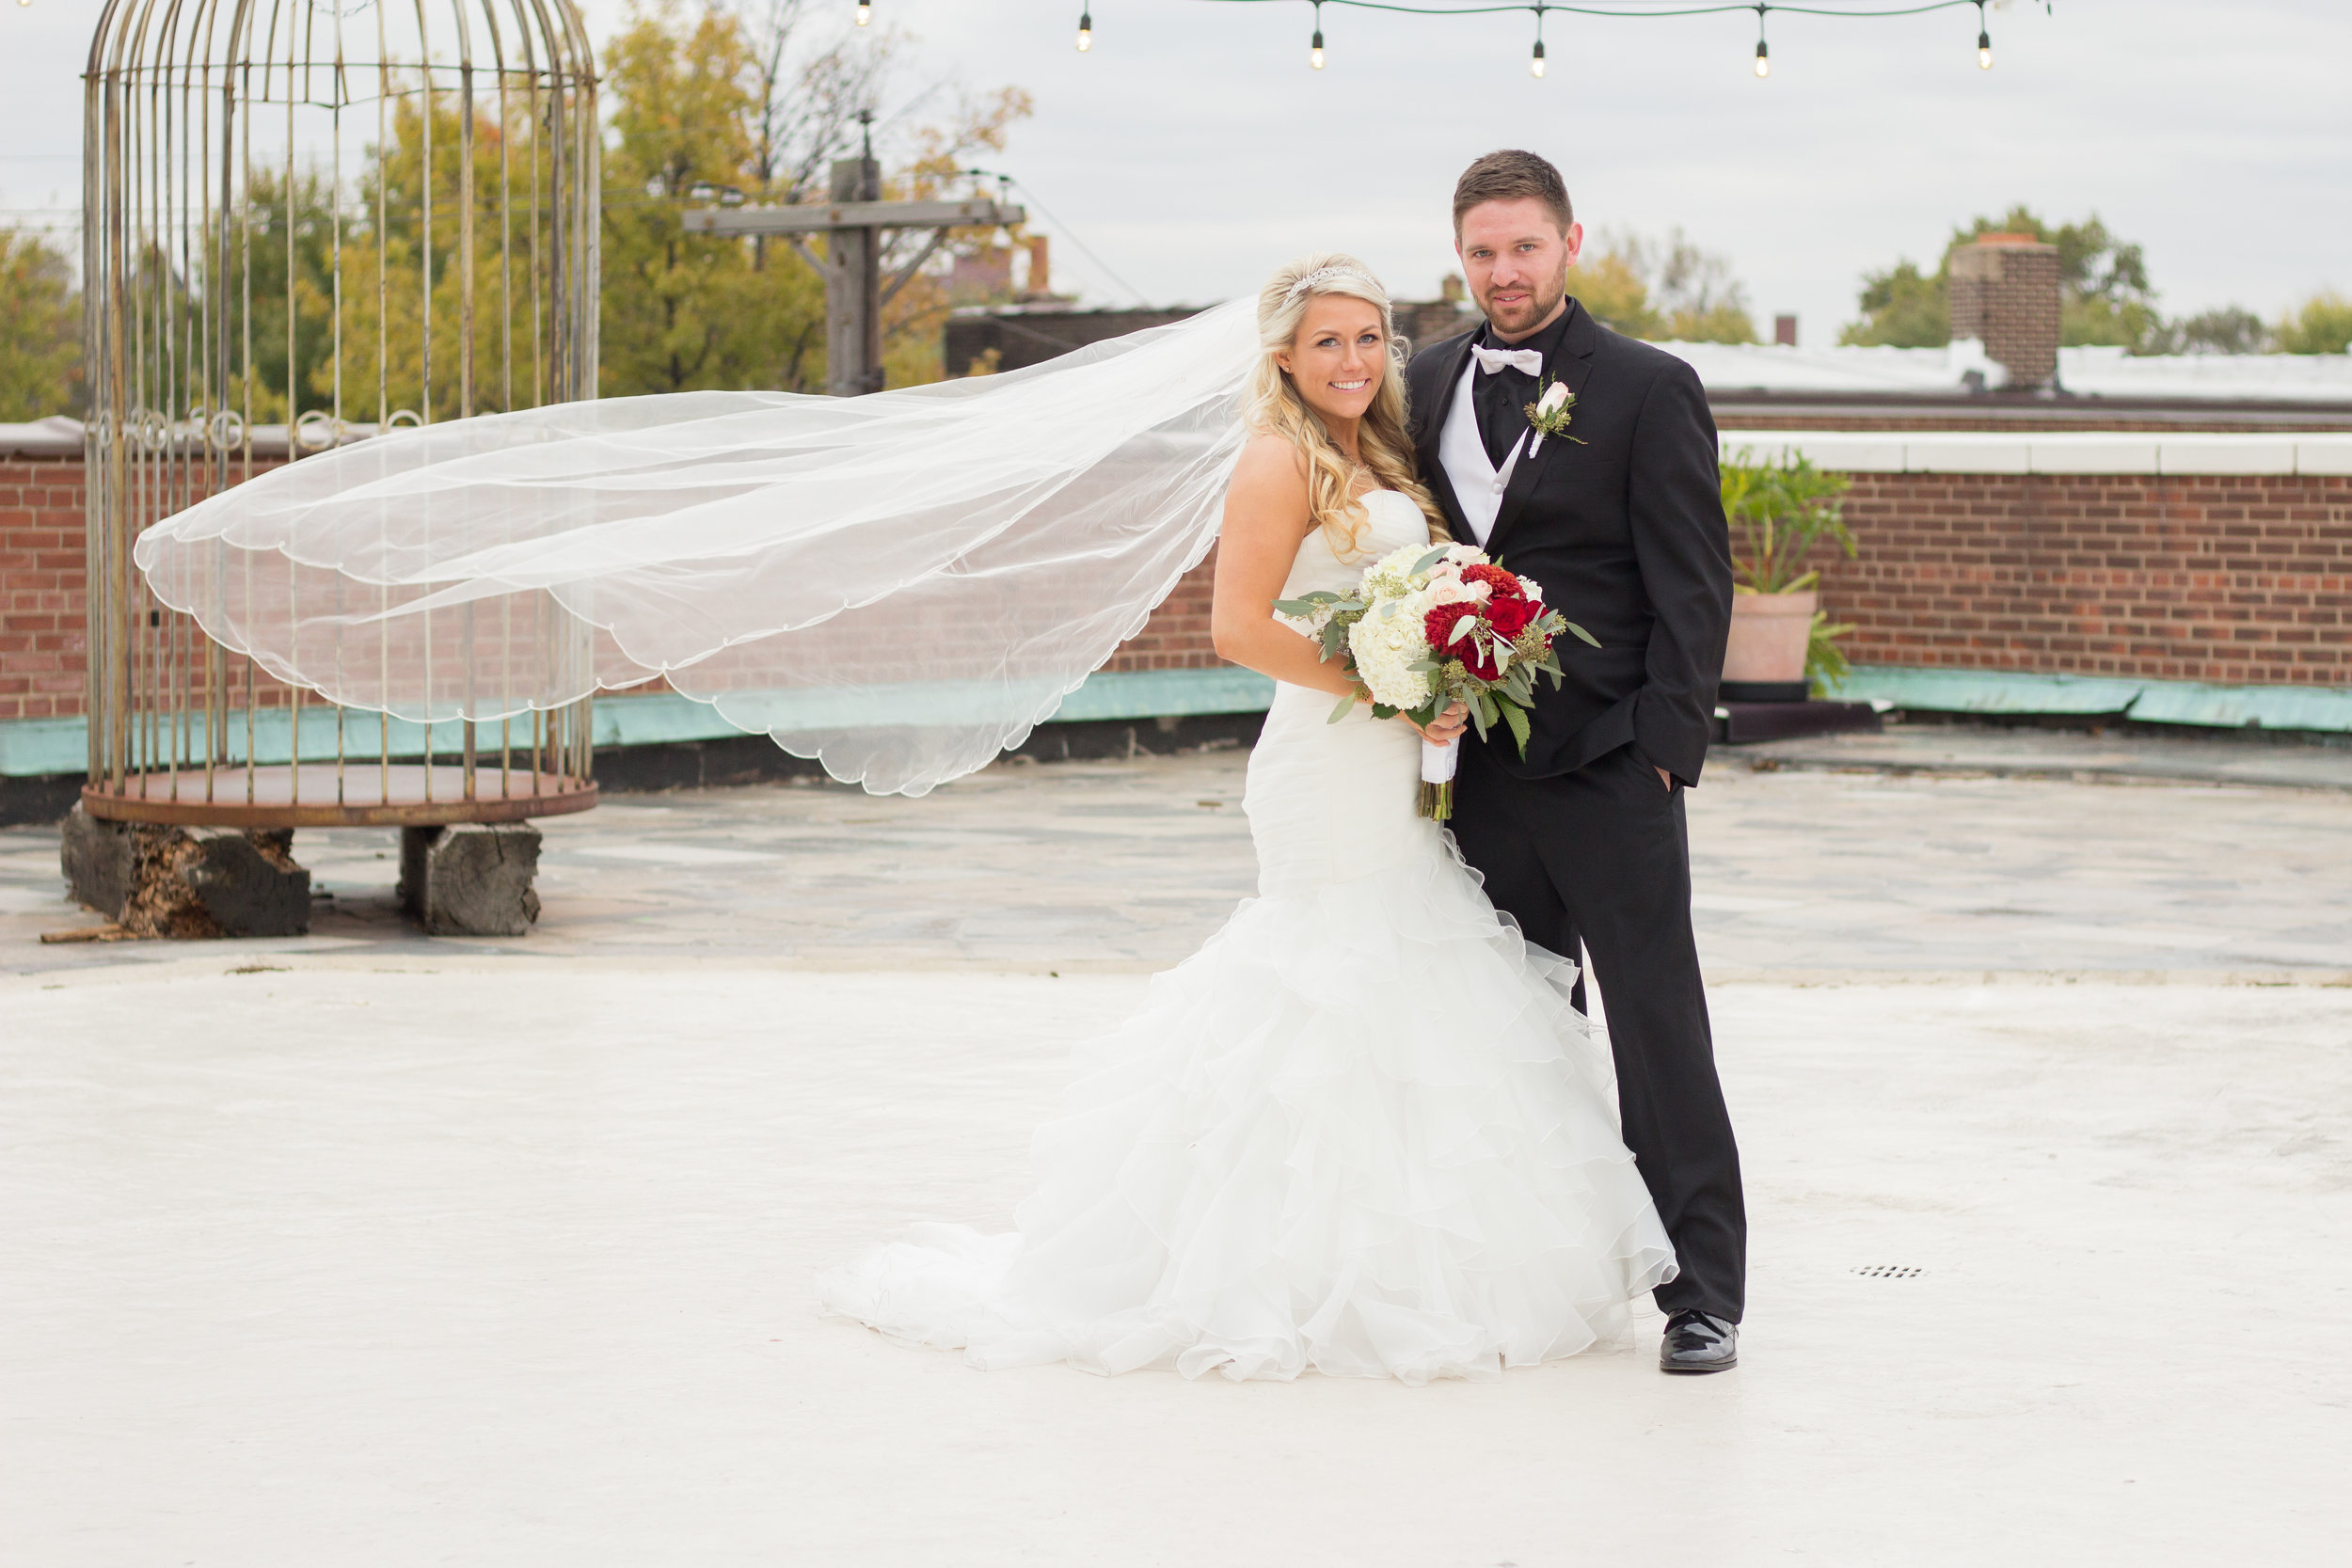 Jessica & Kurtis Wedding_17 - 20171028.jpg